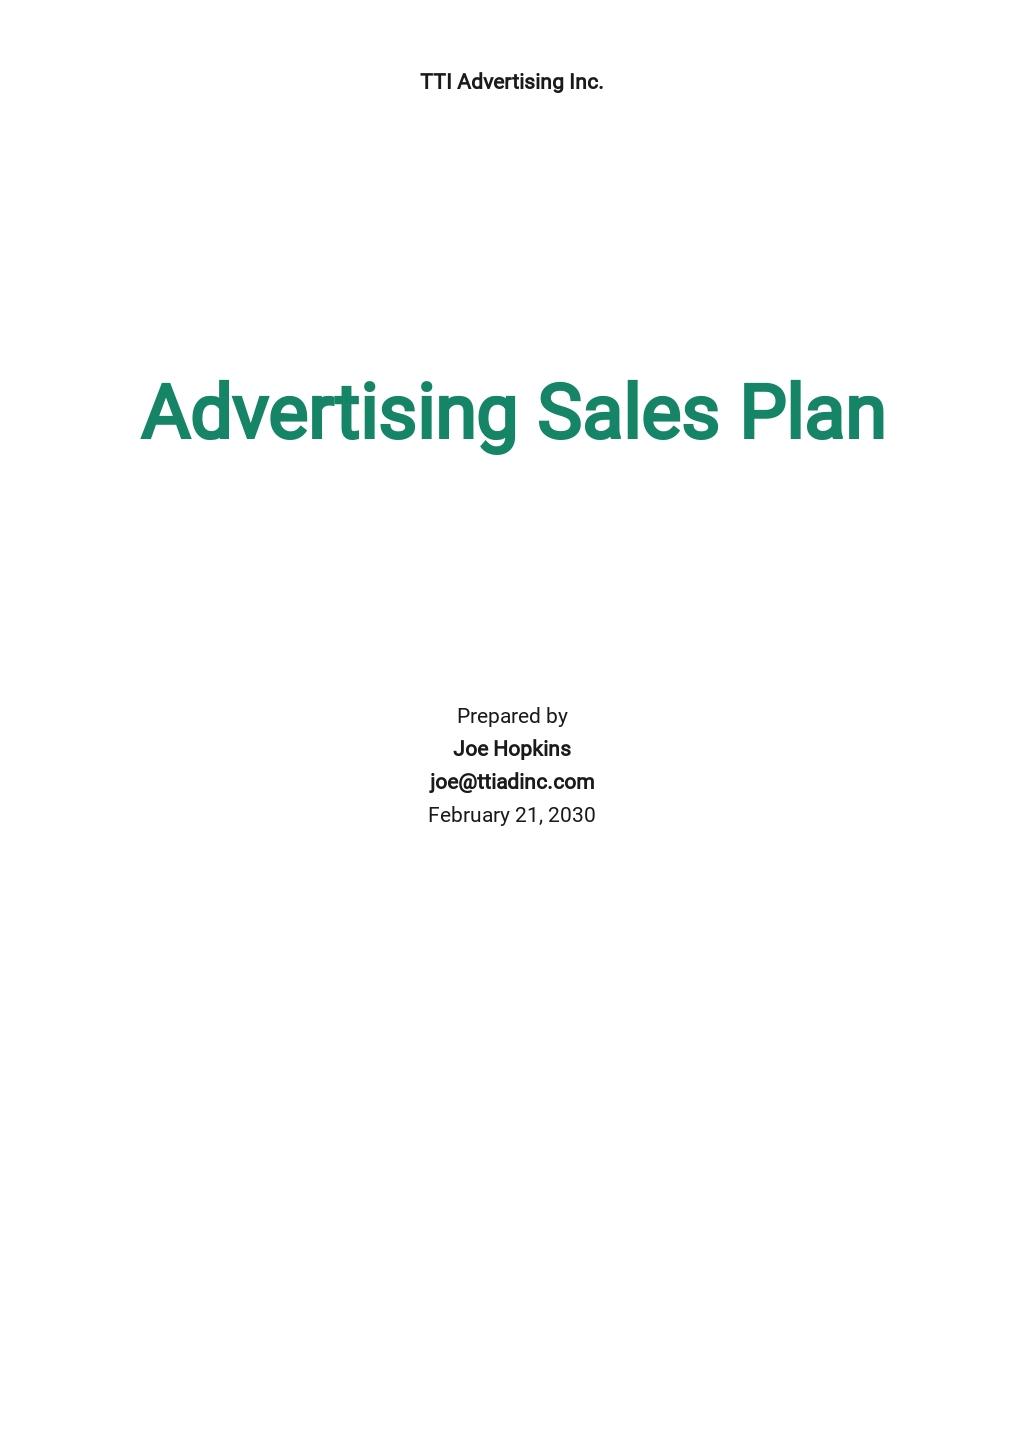 Advertising Sales Plan Template